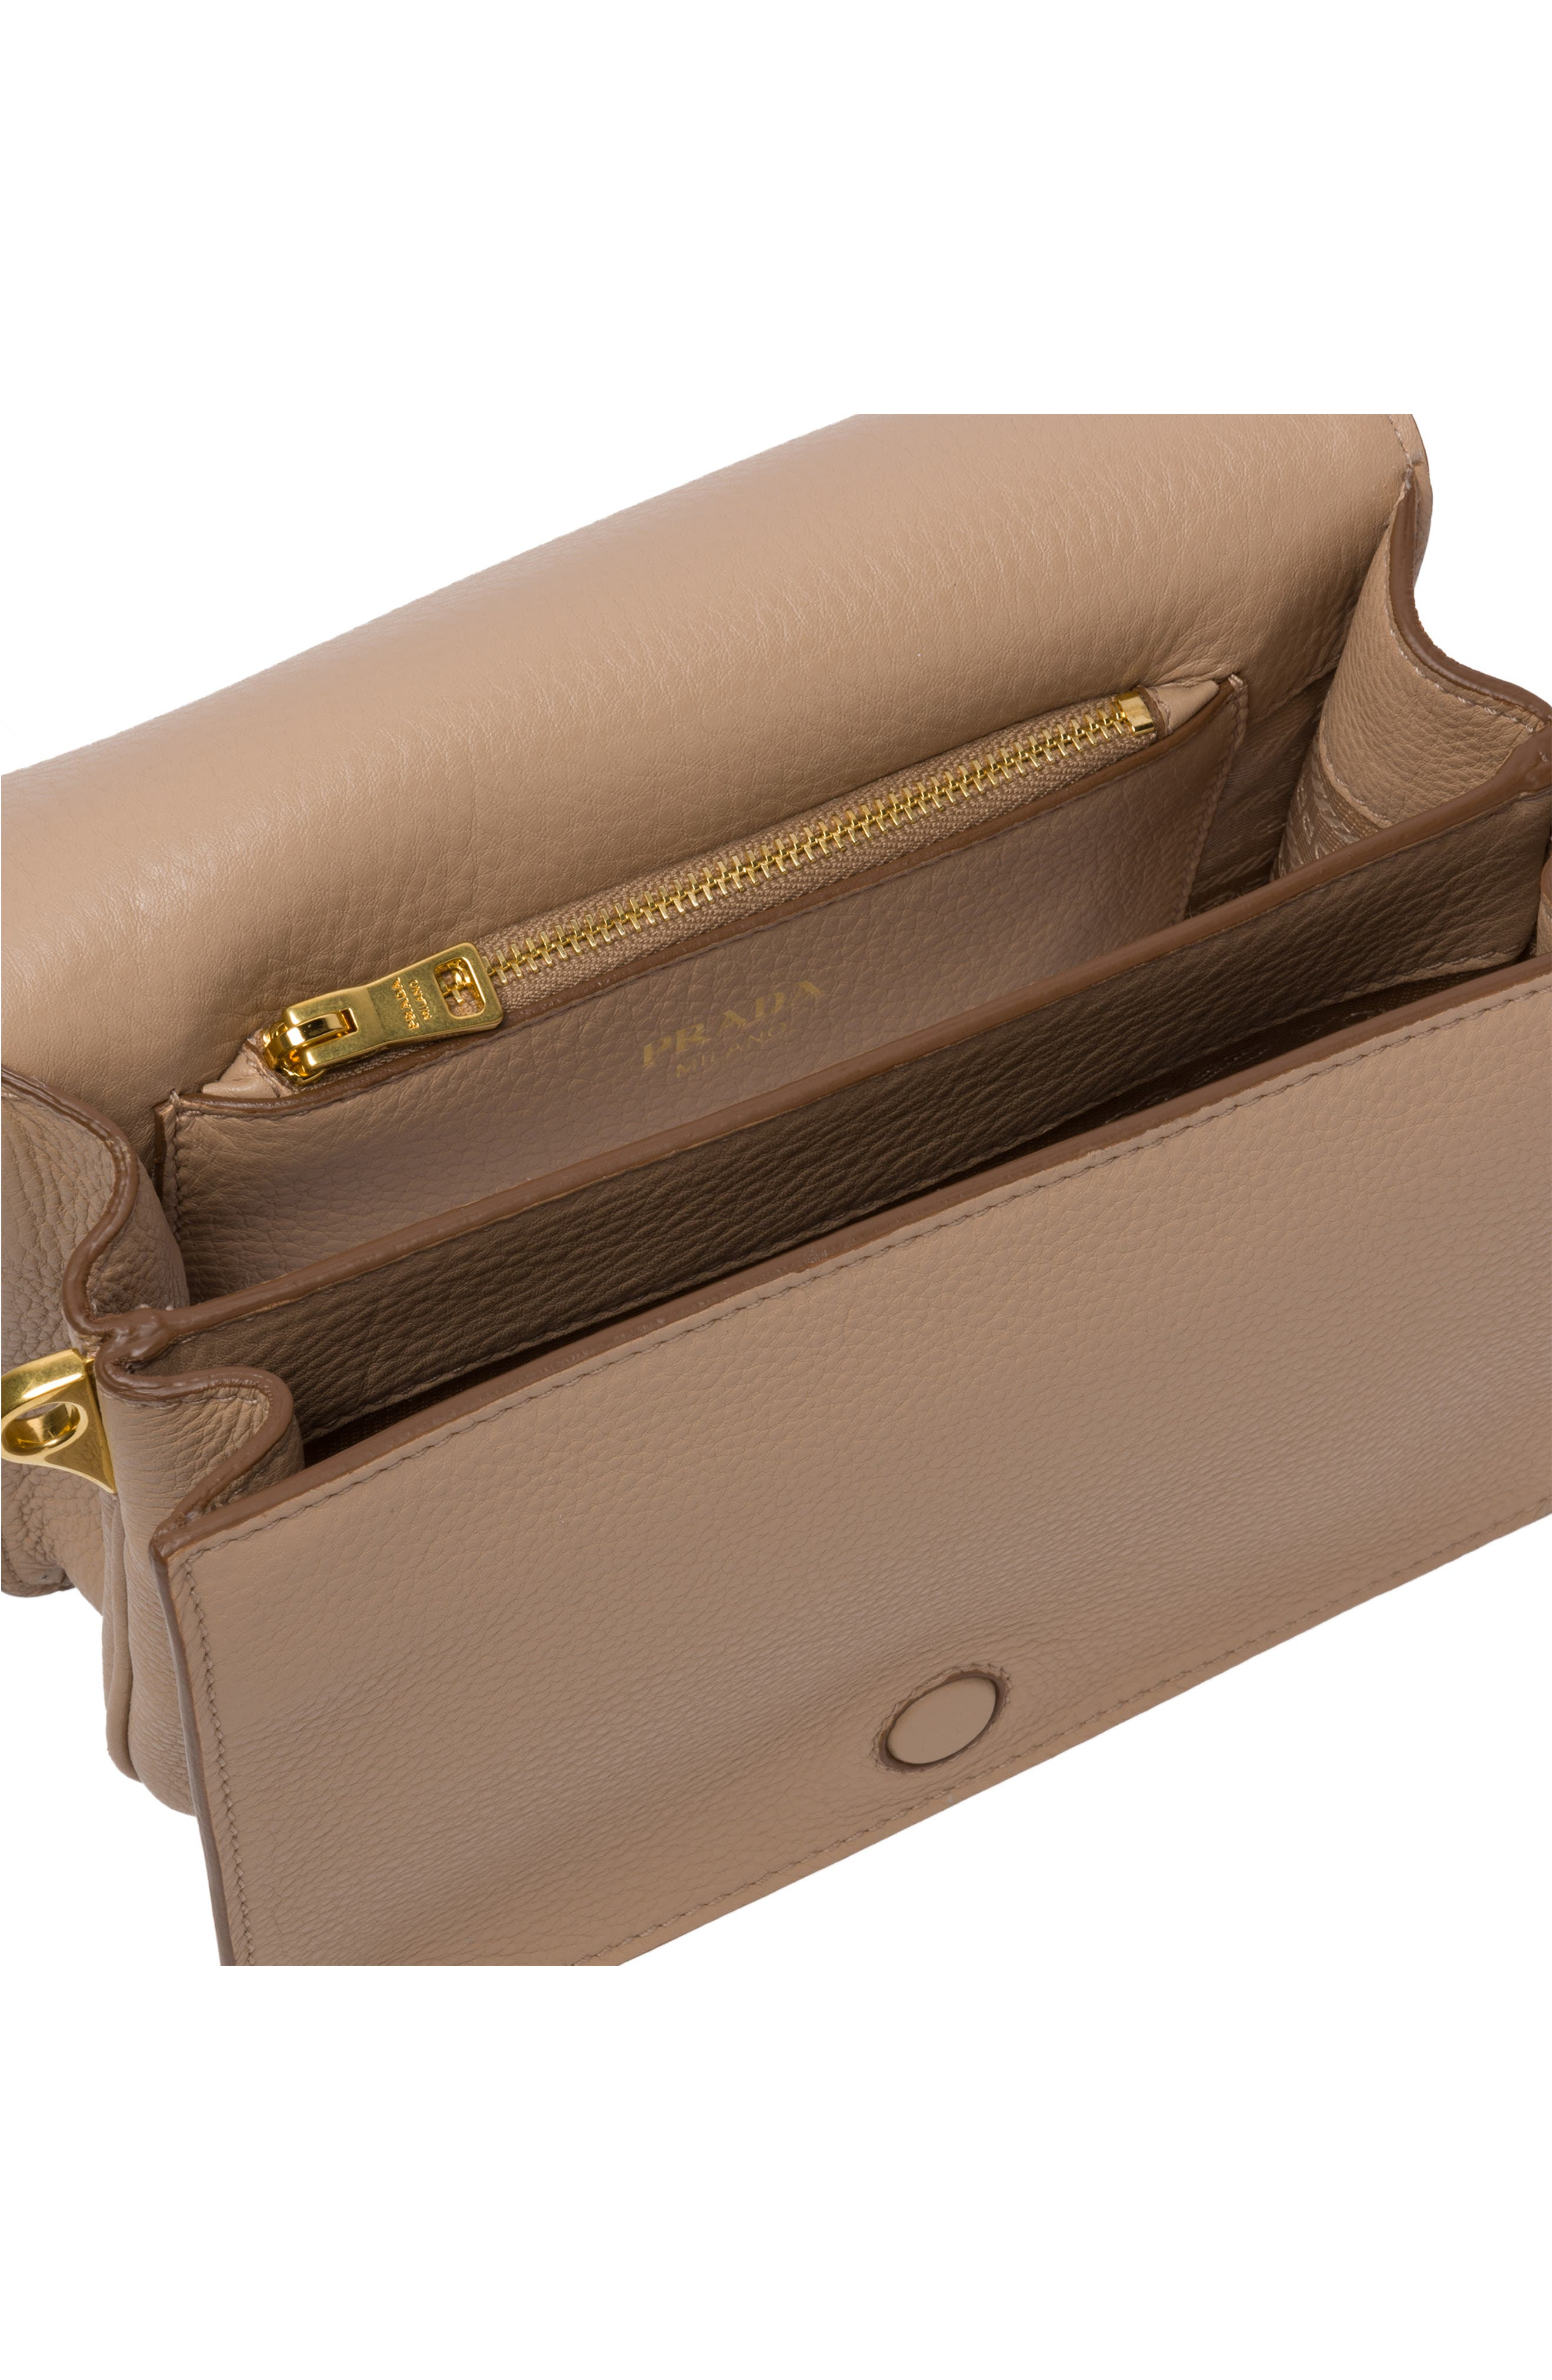 PRADA, Vitello Daino Double Compartment Leather Shoulder Bag, Alternate thumbnail 4, color, CAMMEO